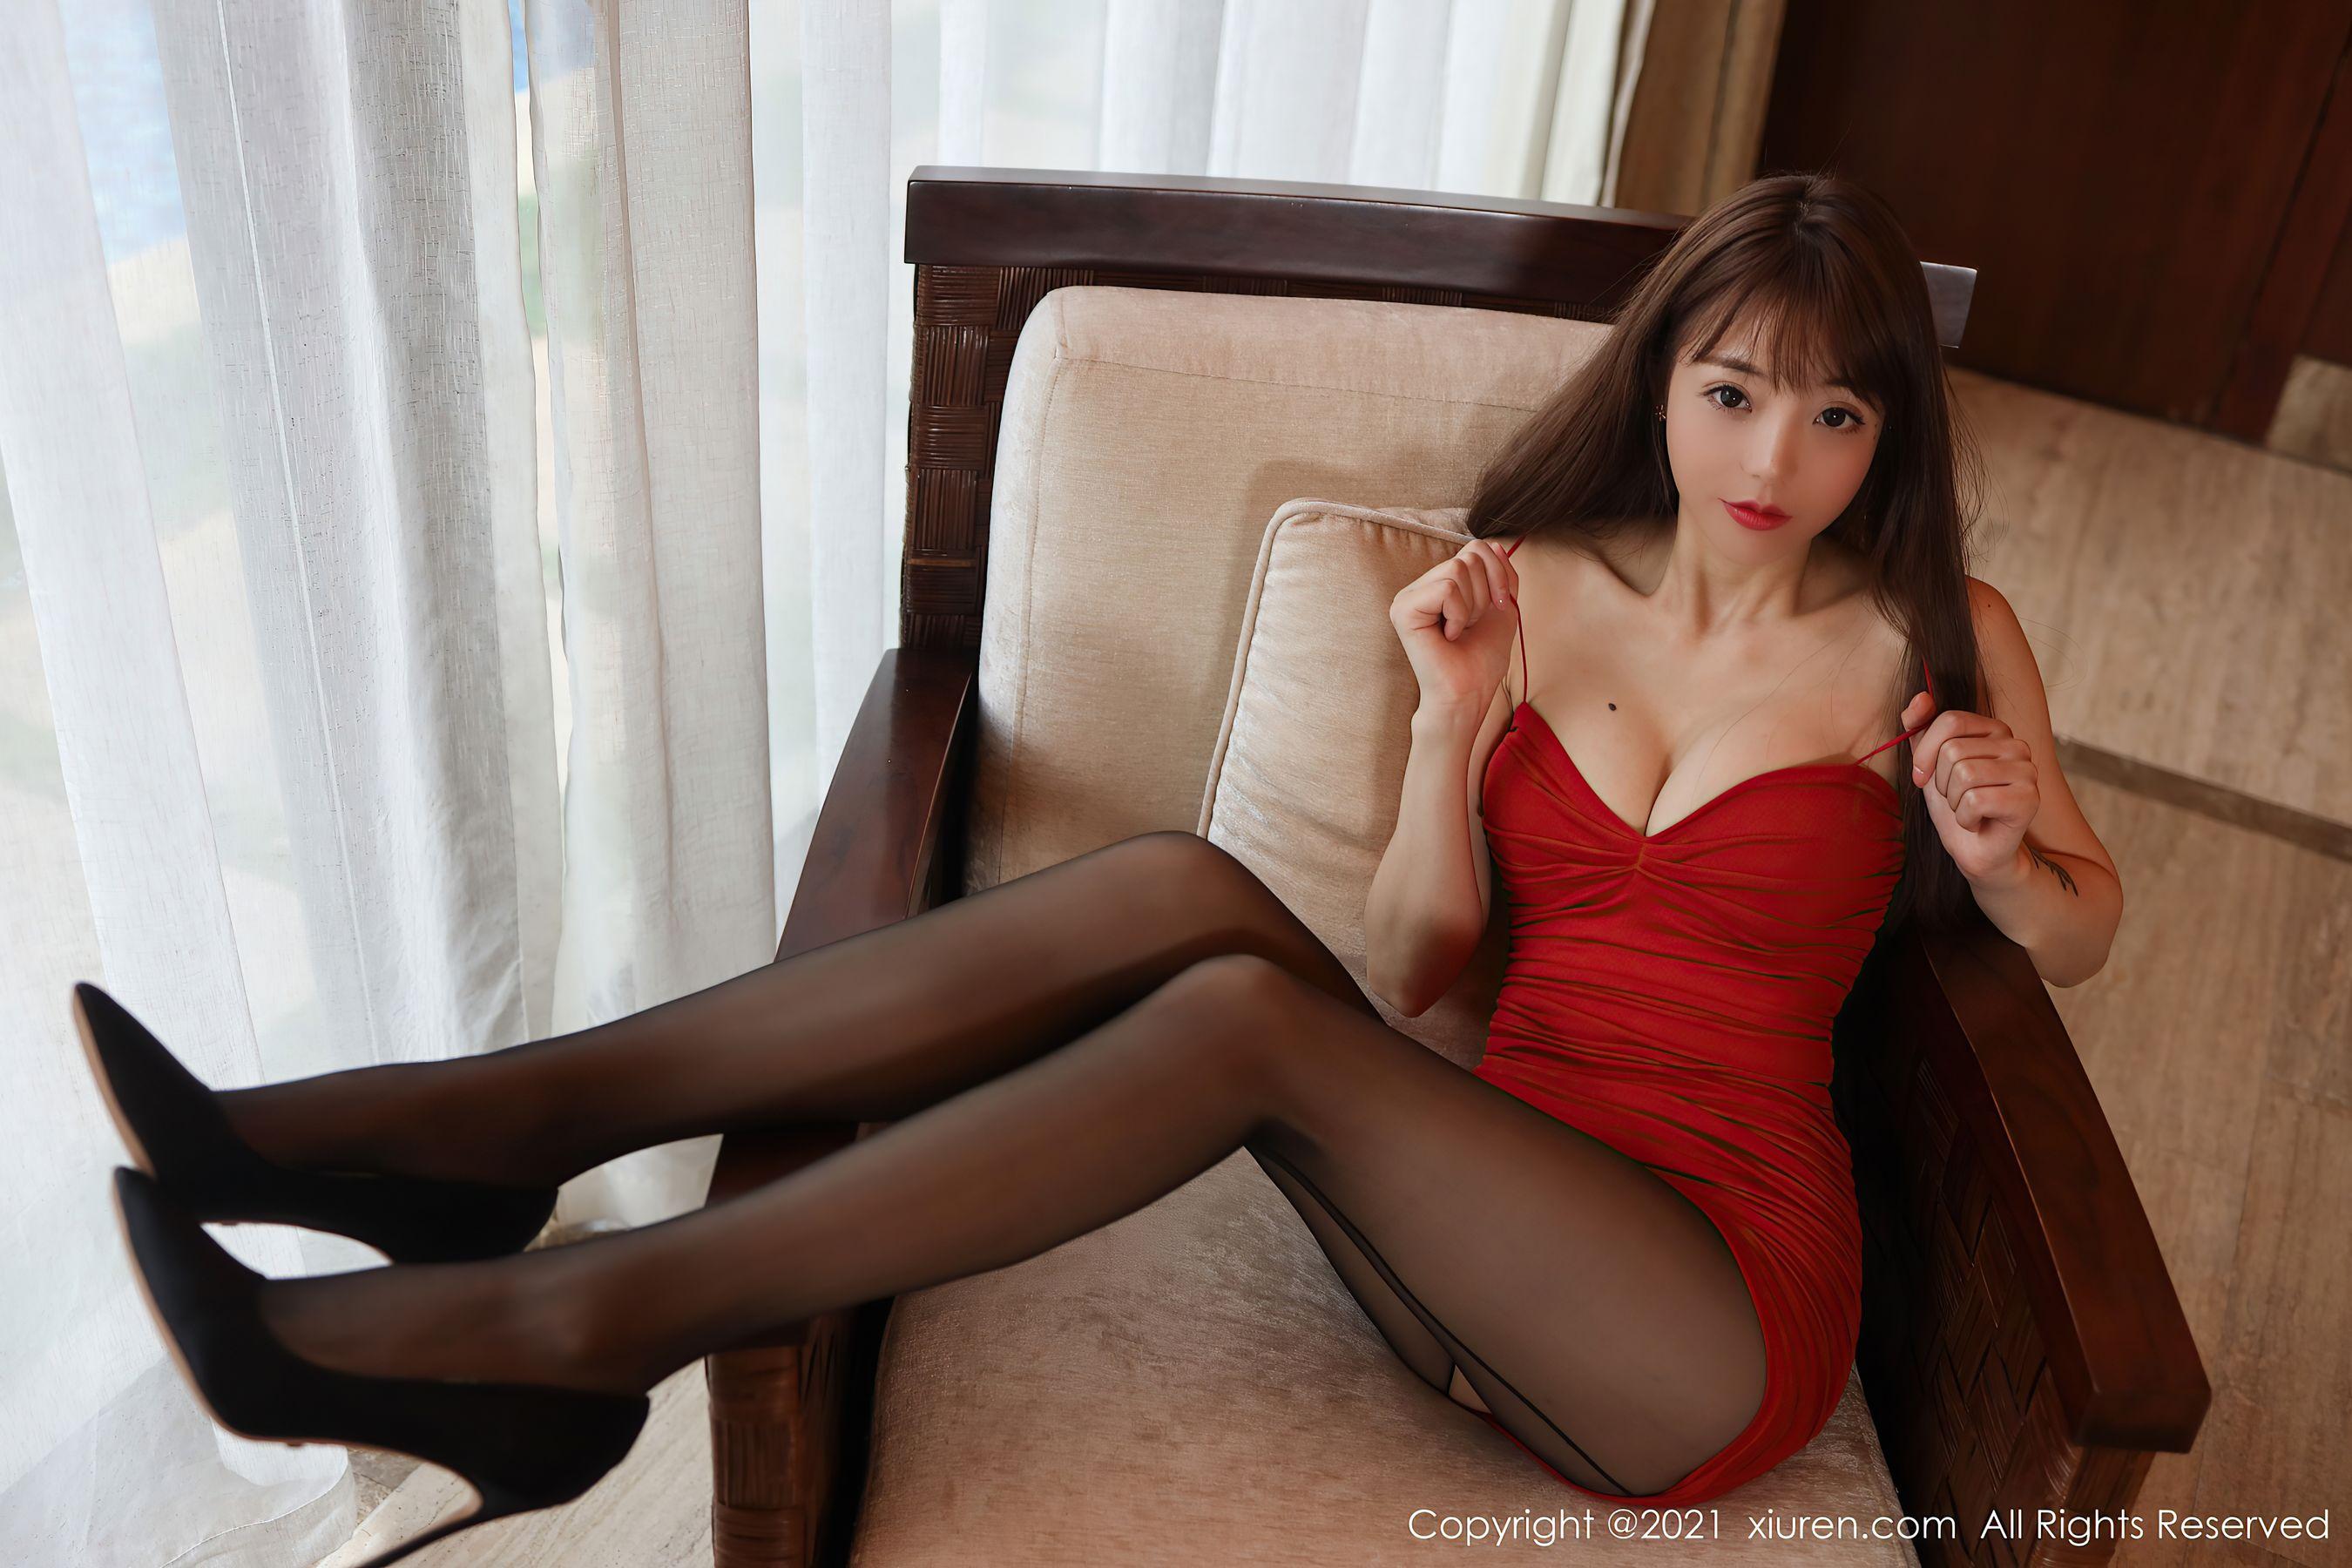 VOL.945 [秀人网]丝袜美臀黑丝美腿吊带:佘贝拉(佘贝拉bella)超高清写真套图(54P)